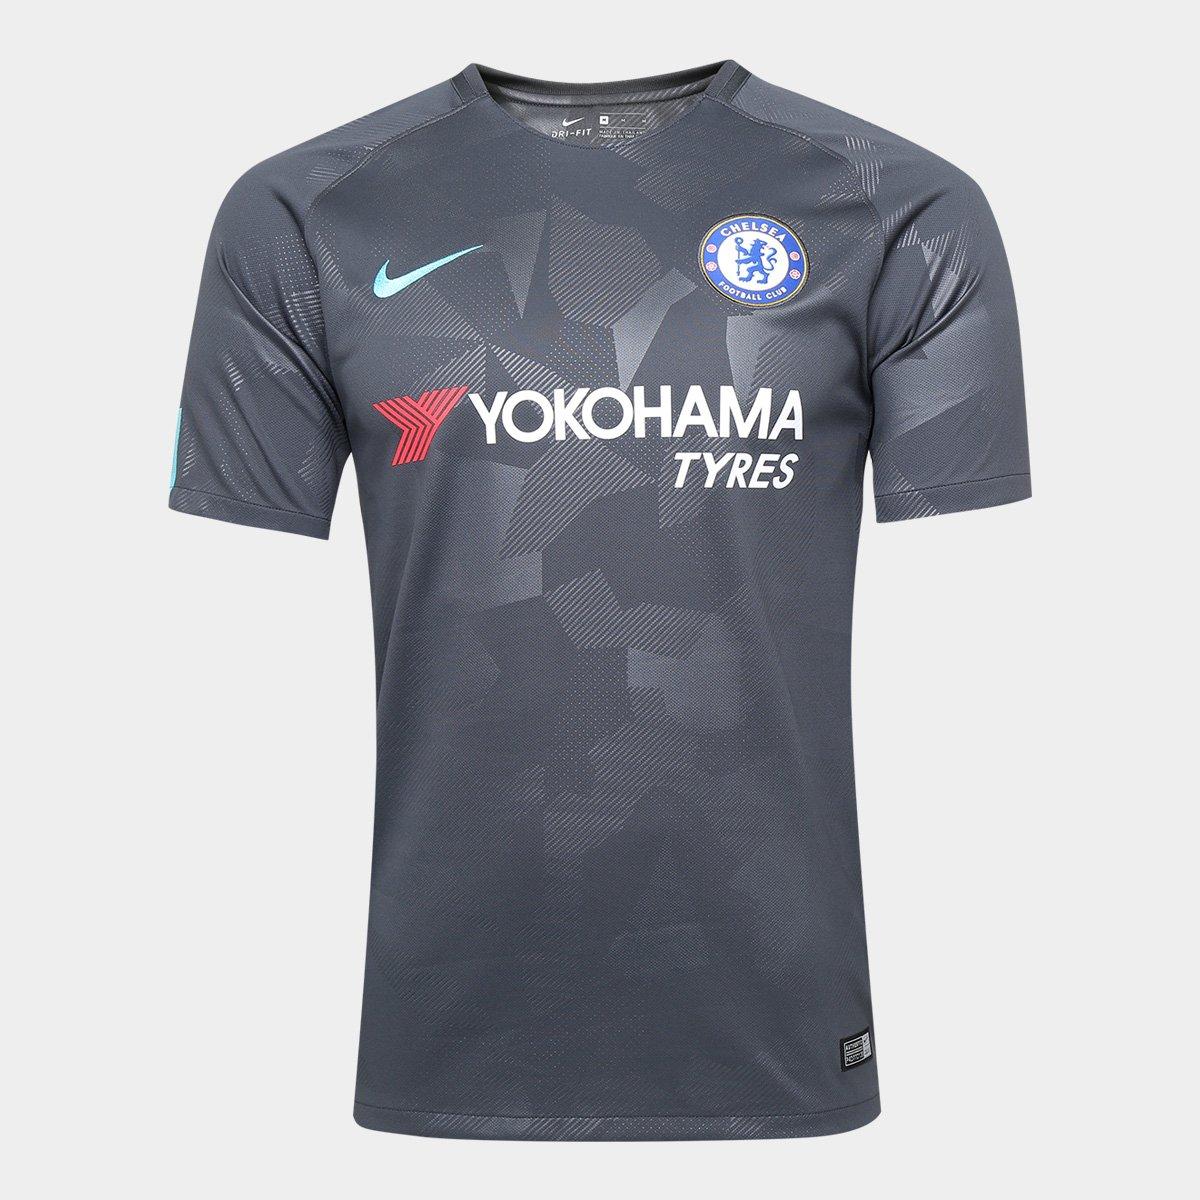 Camisa Chelsea Third 17 18 S N Torcedor Nike Masculina Cinza E Azul Em Promocao No Oferta Esperta